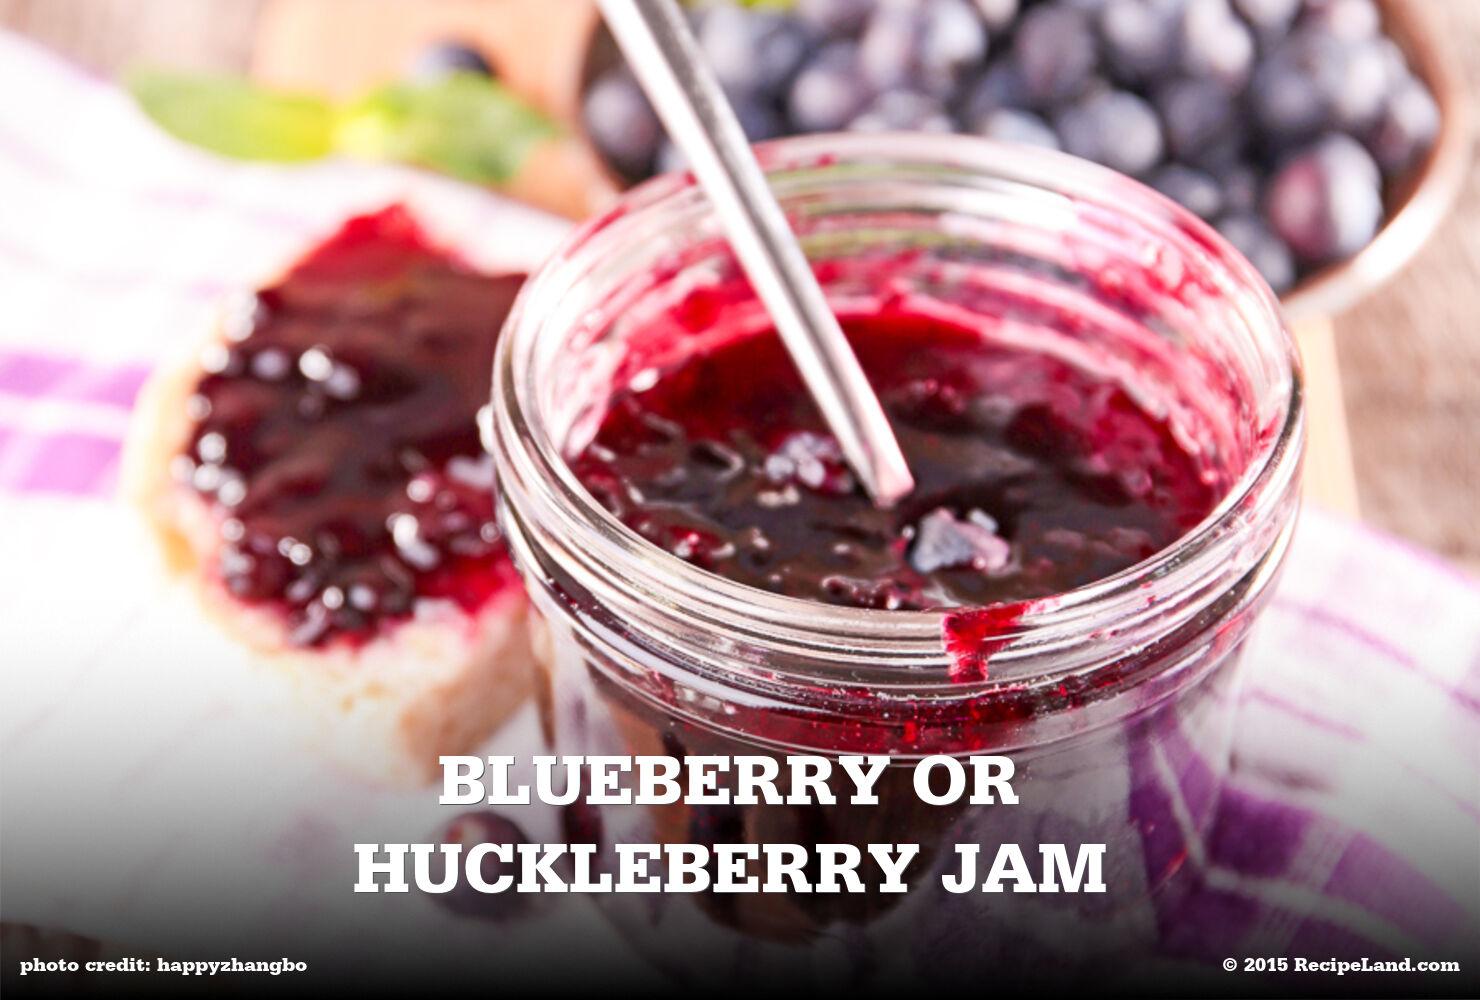 Blueberry or Huckleberry Jam